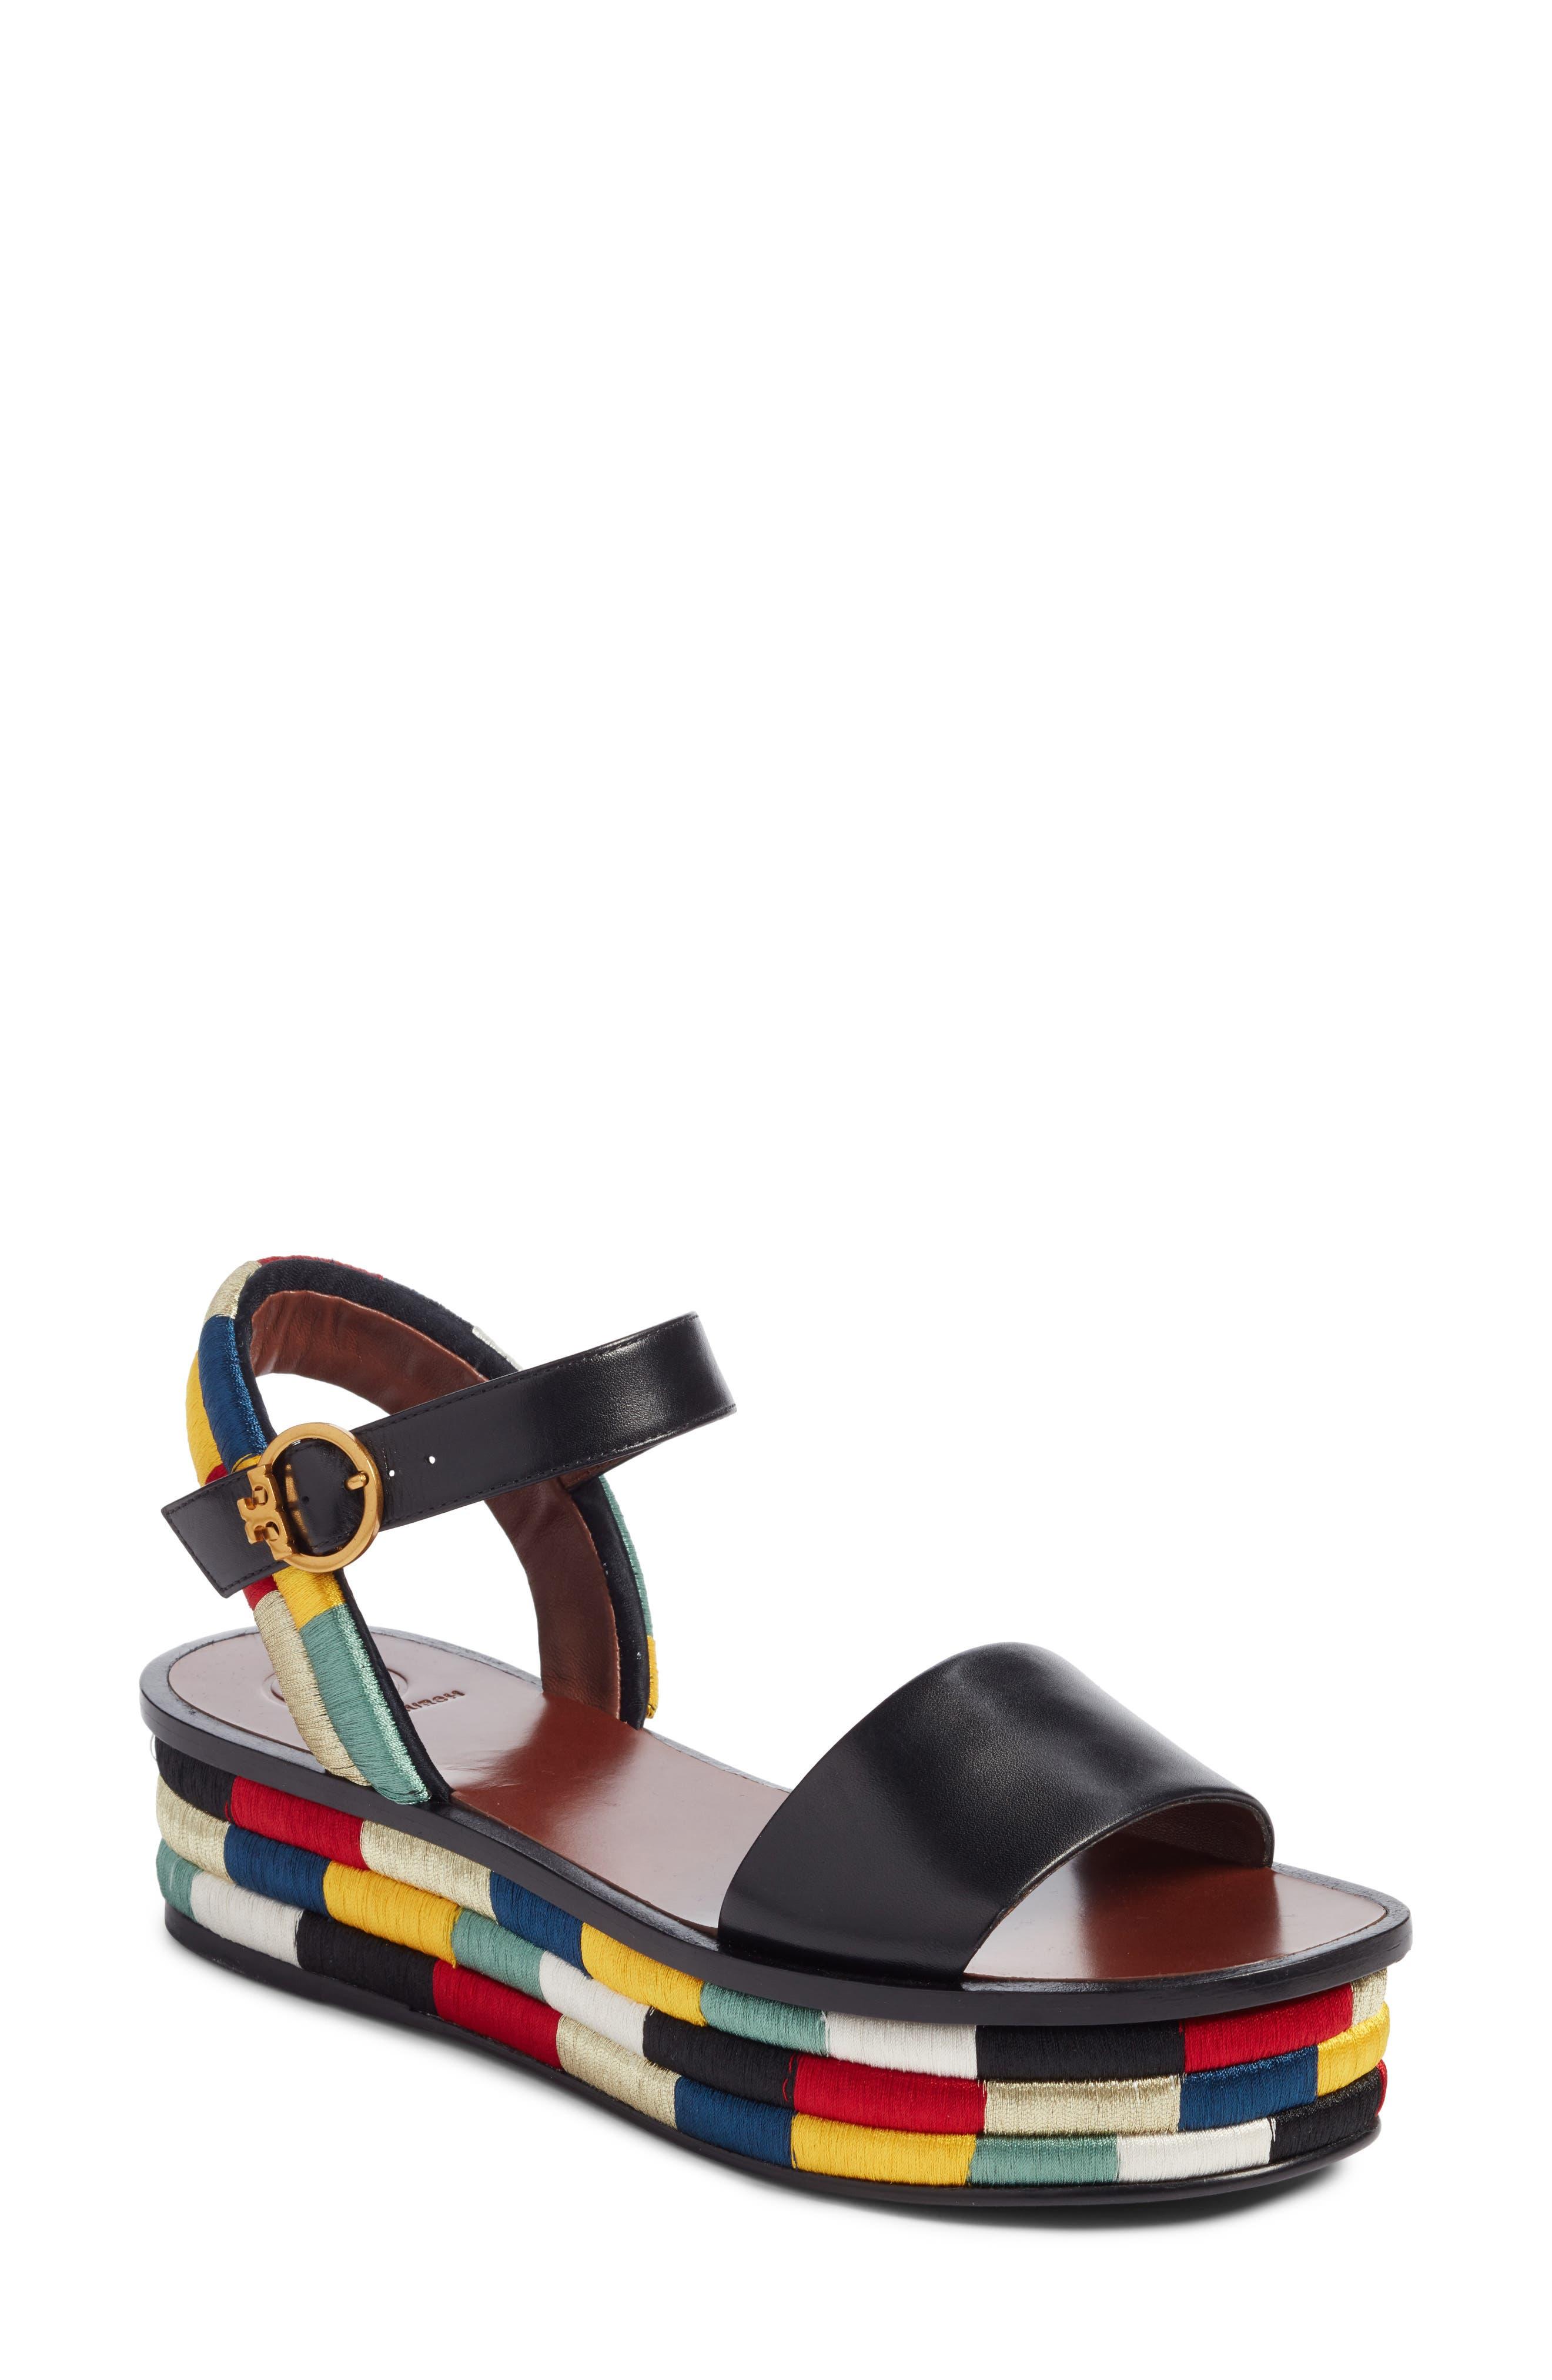 Camilla Platform Sandal,                             Main thumbnail 1, color,                             Black